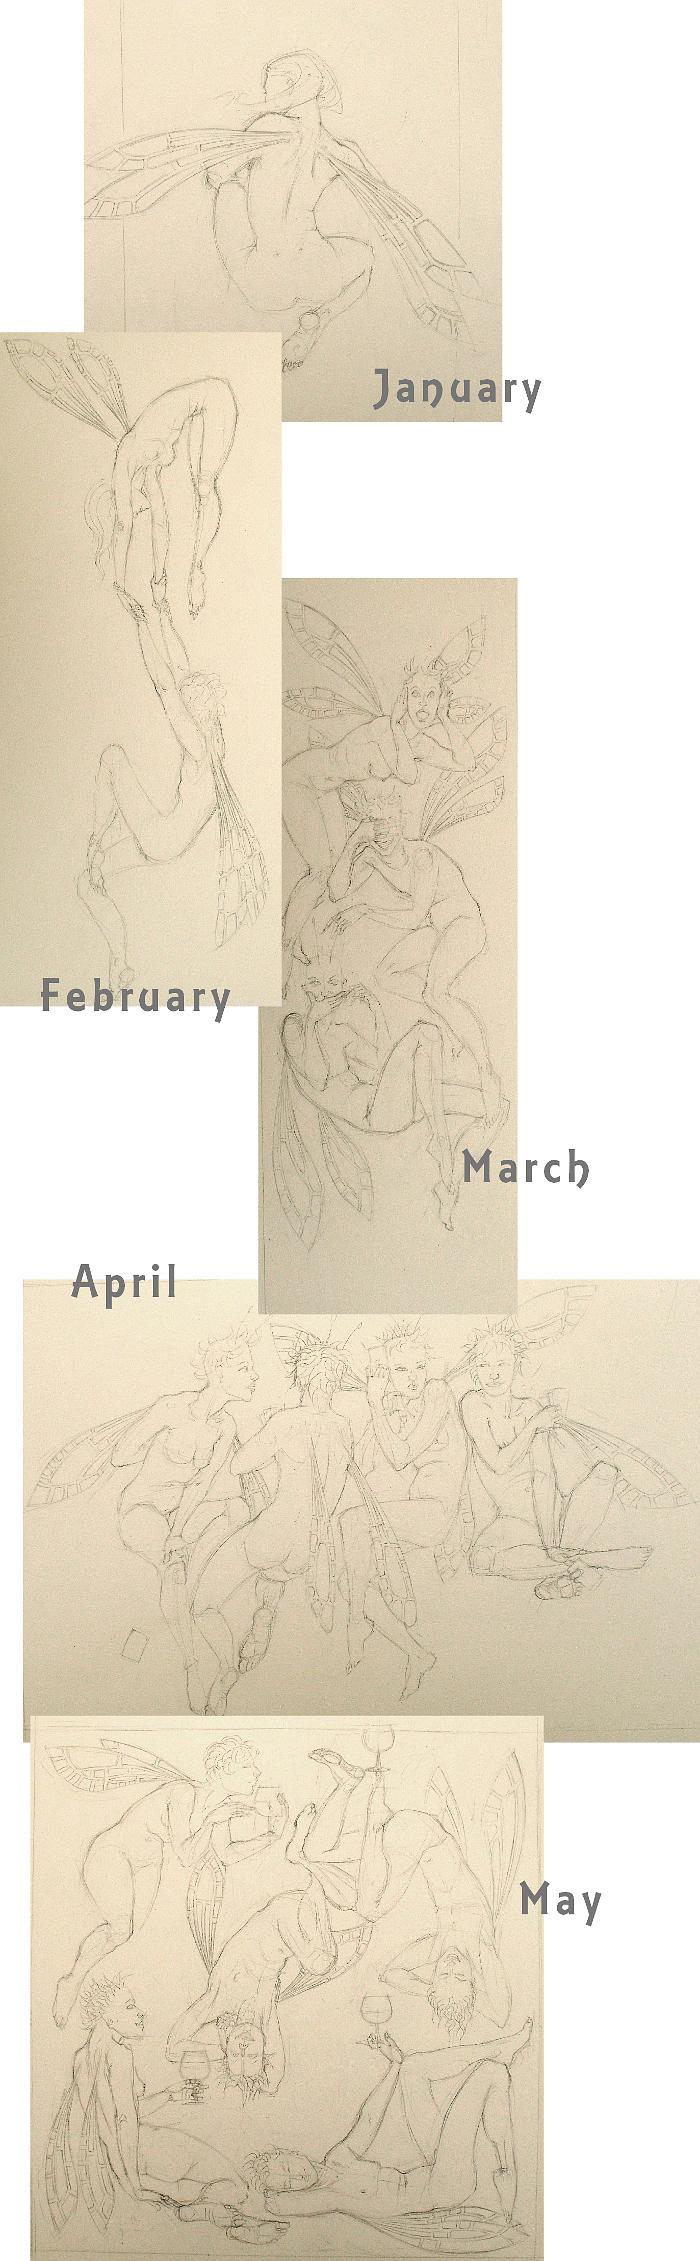 Sketches for the 2012 calendar